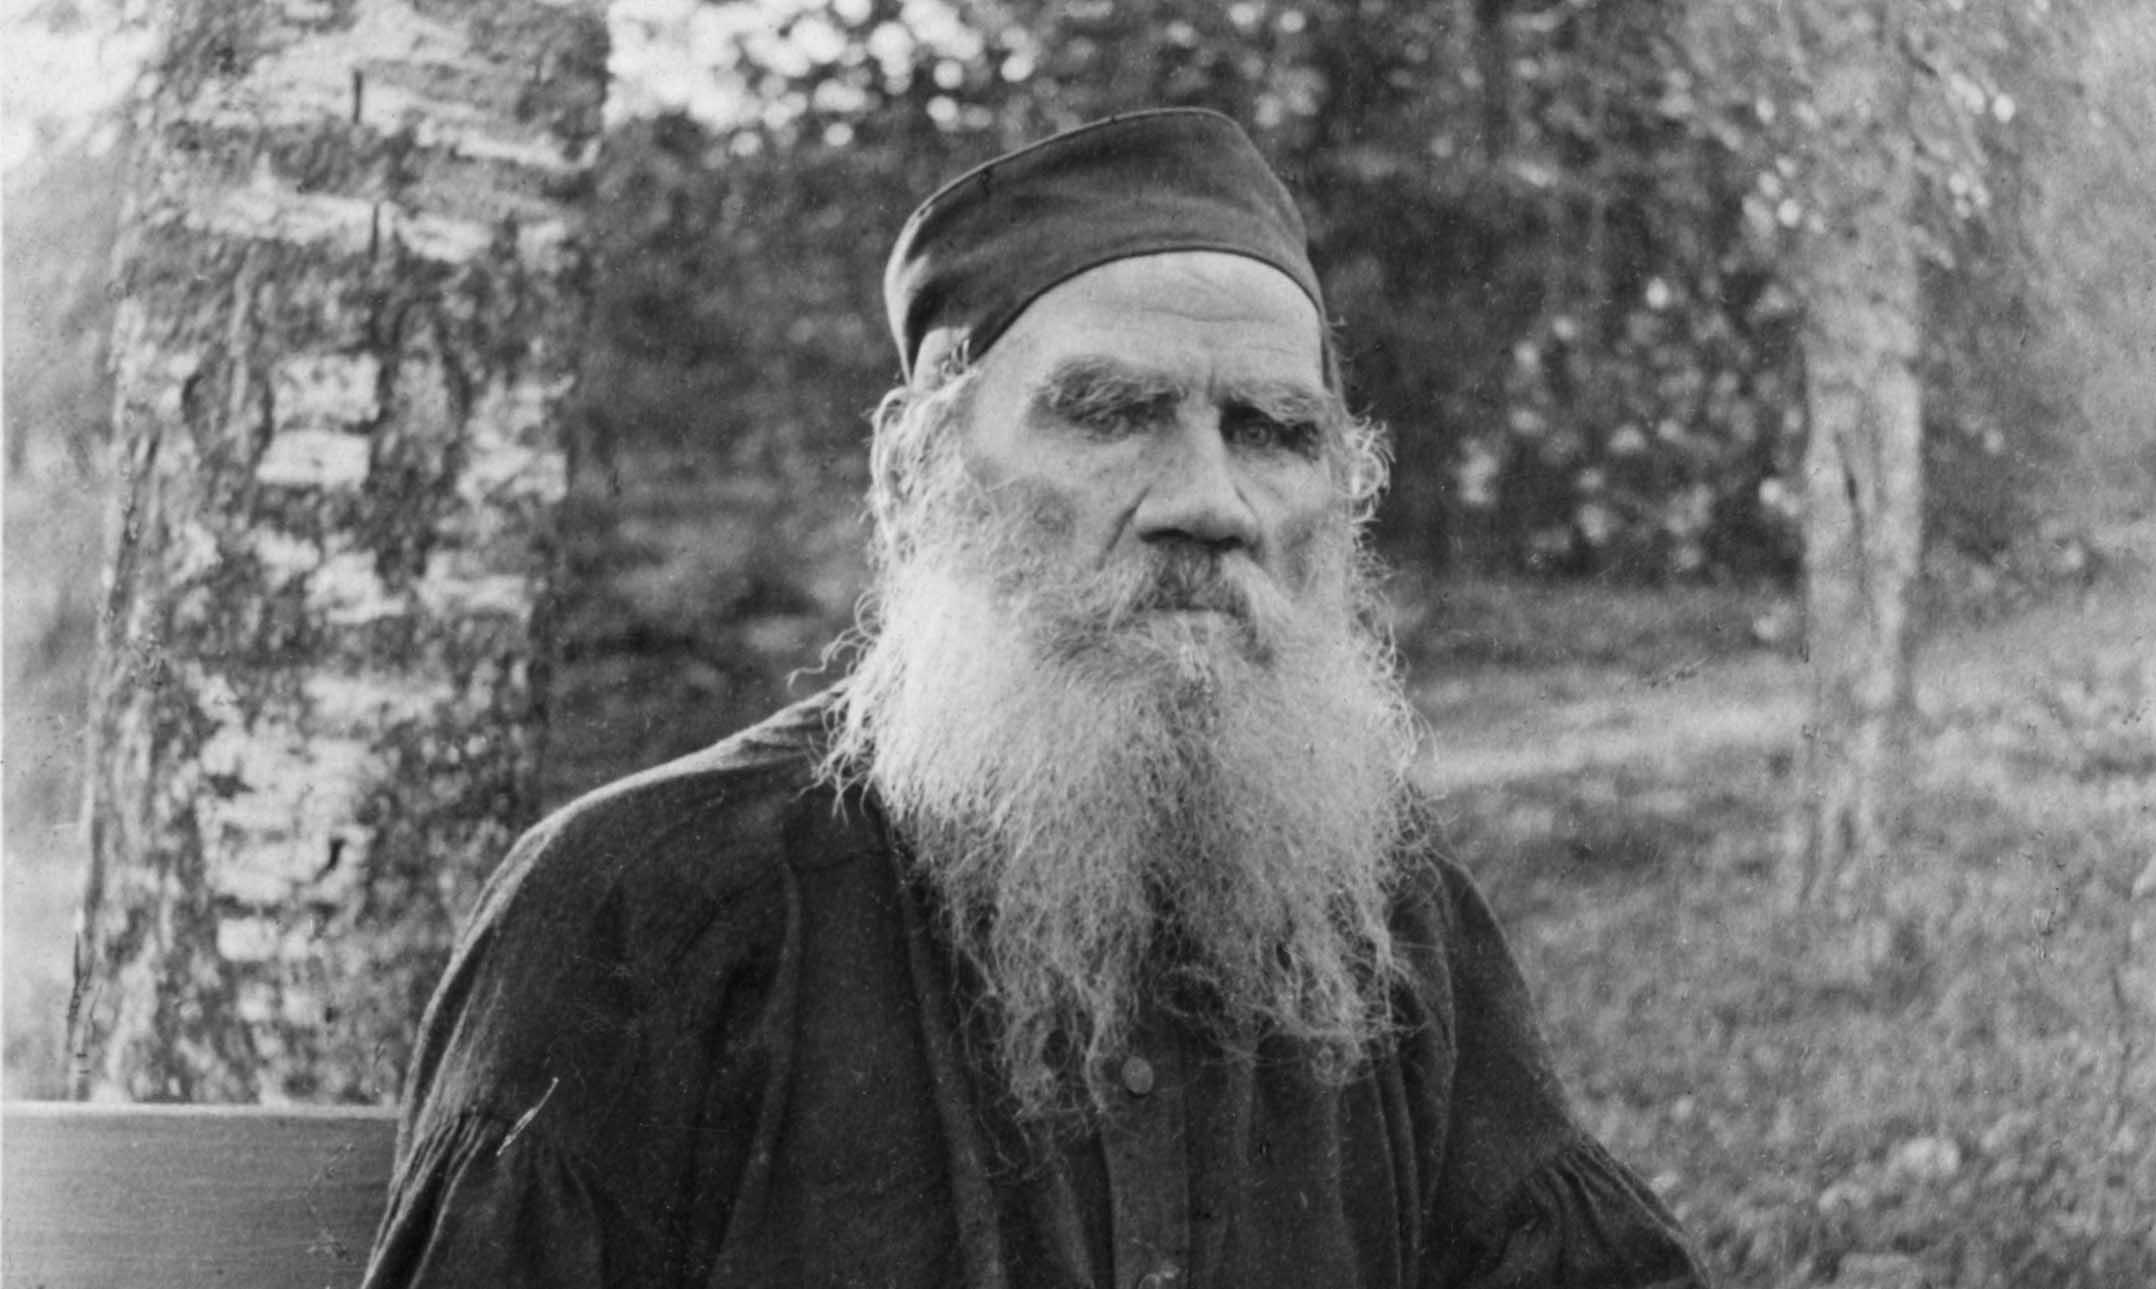 Leo_Tolstoy_1897_black_and_white_37767u.jpg